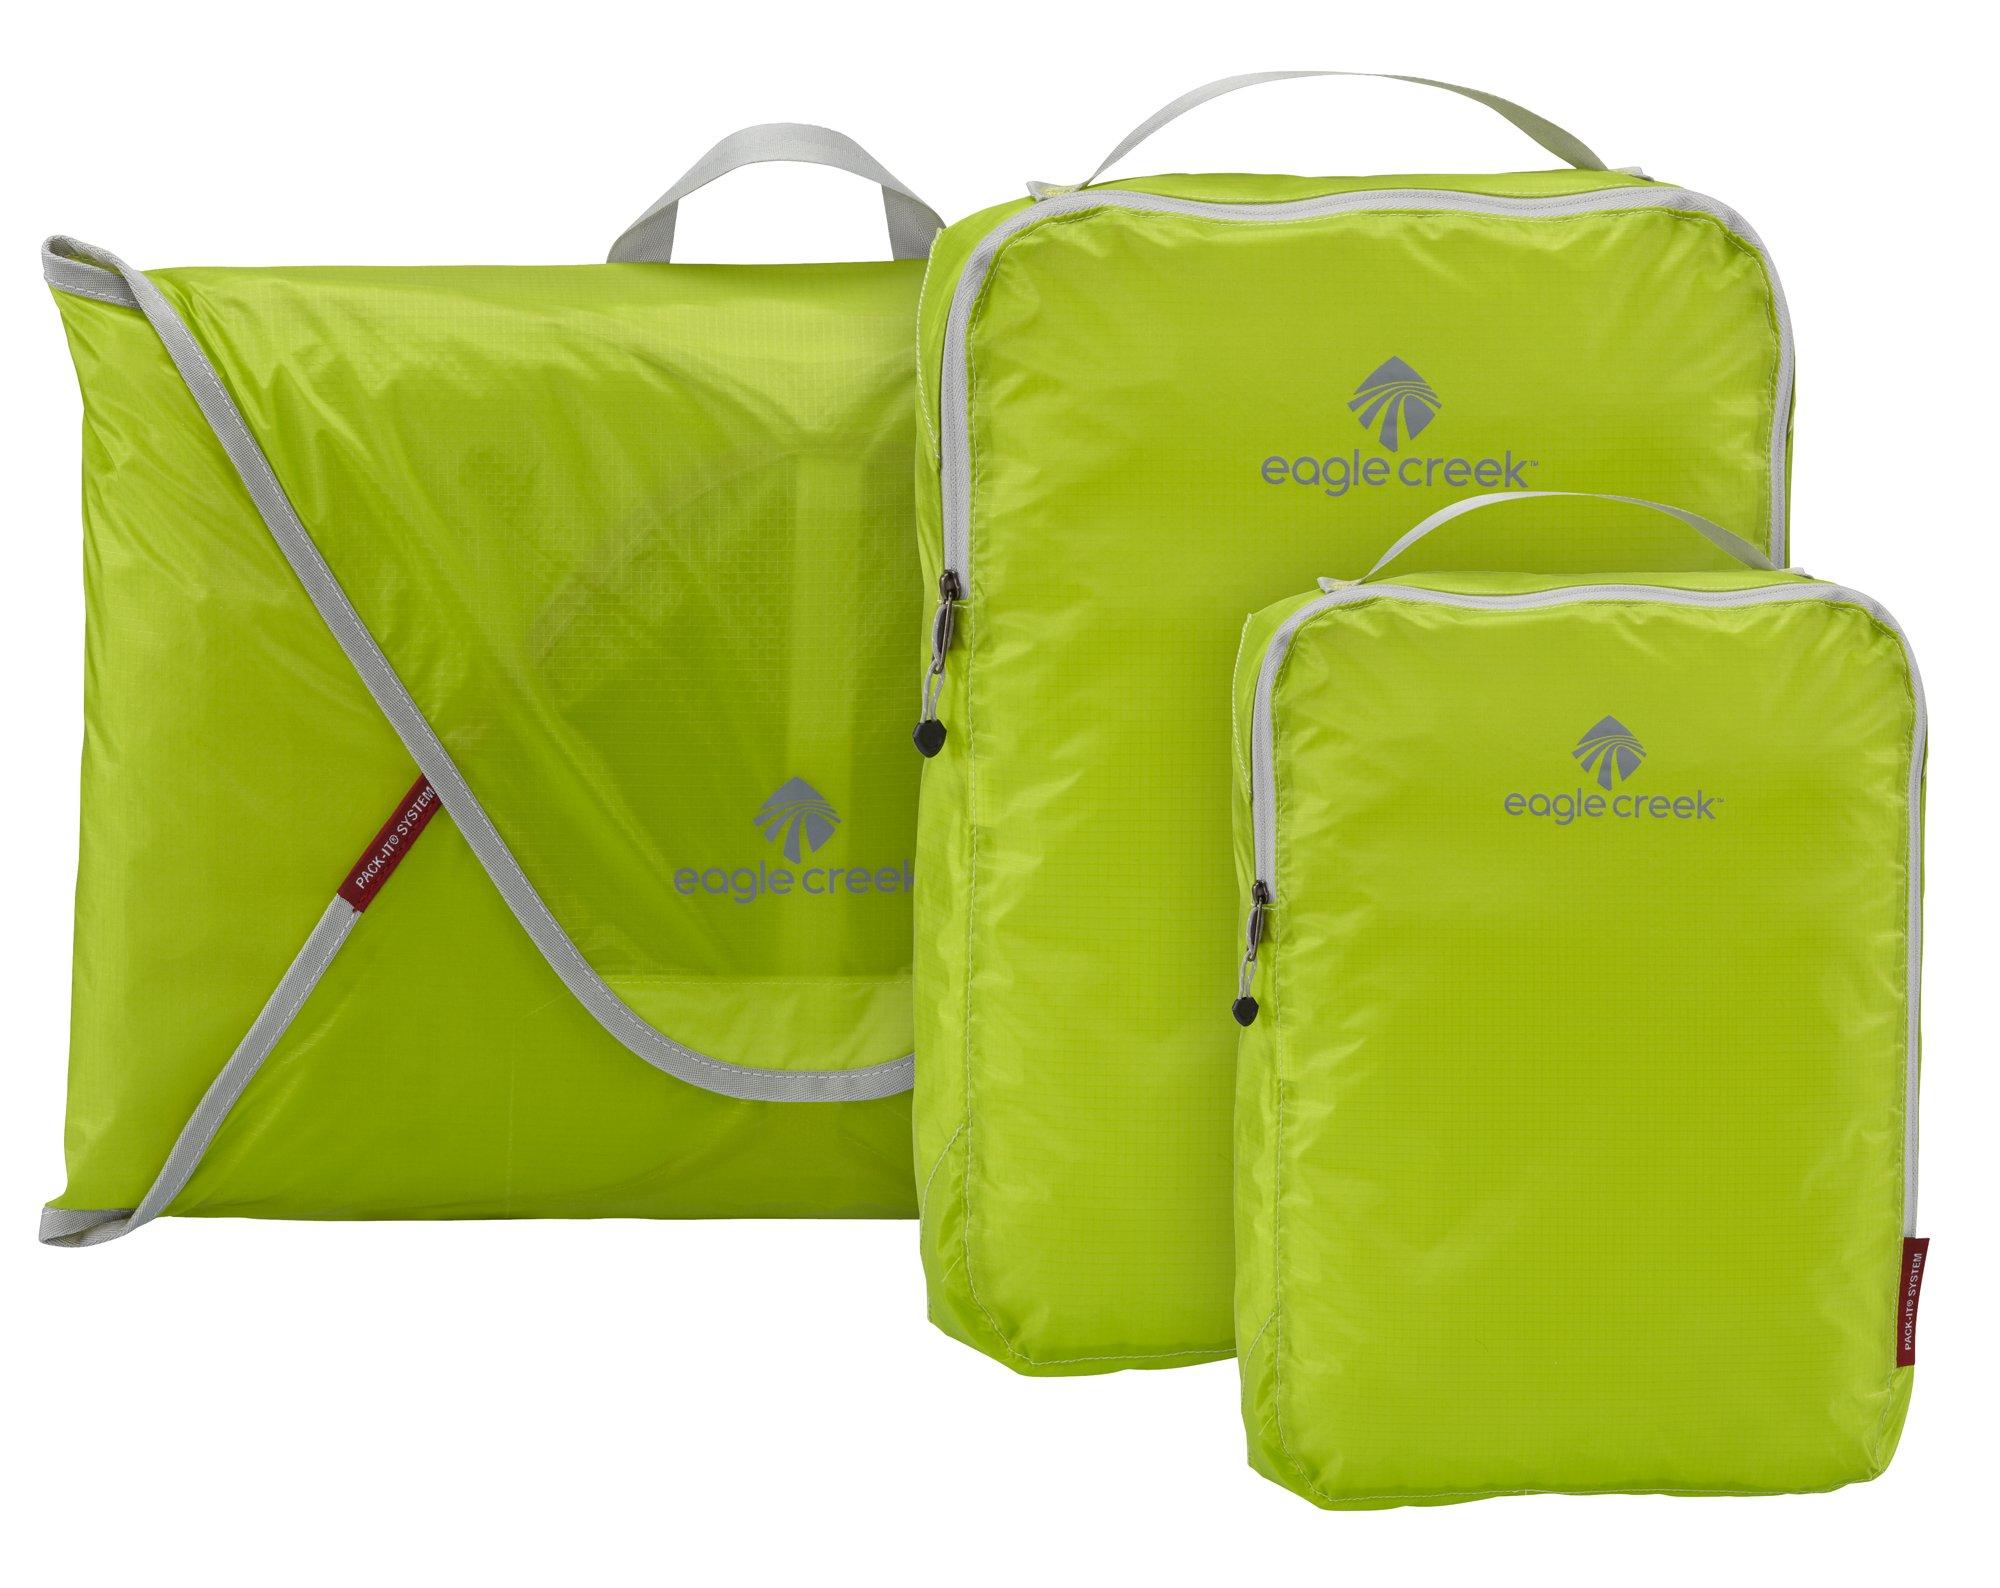 Eagle Creek Pack-It Specter Packing Organizer Starter Set , Strobe Green, Set of 3 by Eagle Creek